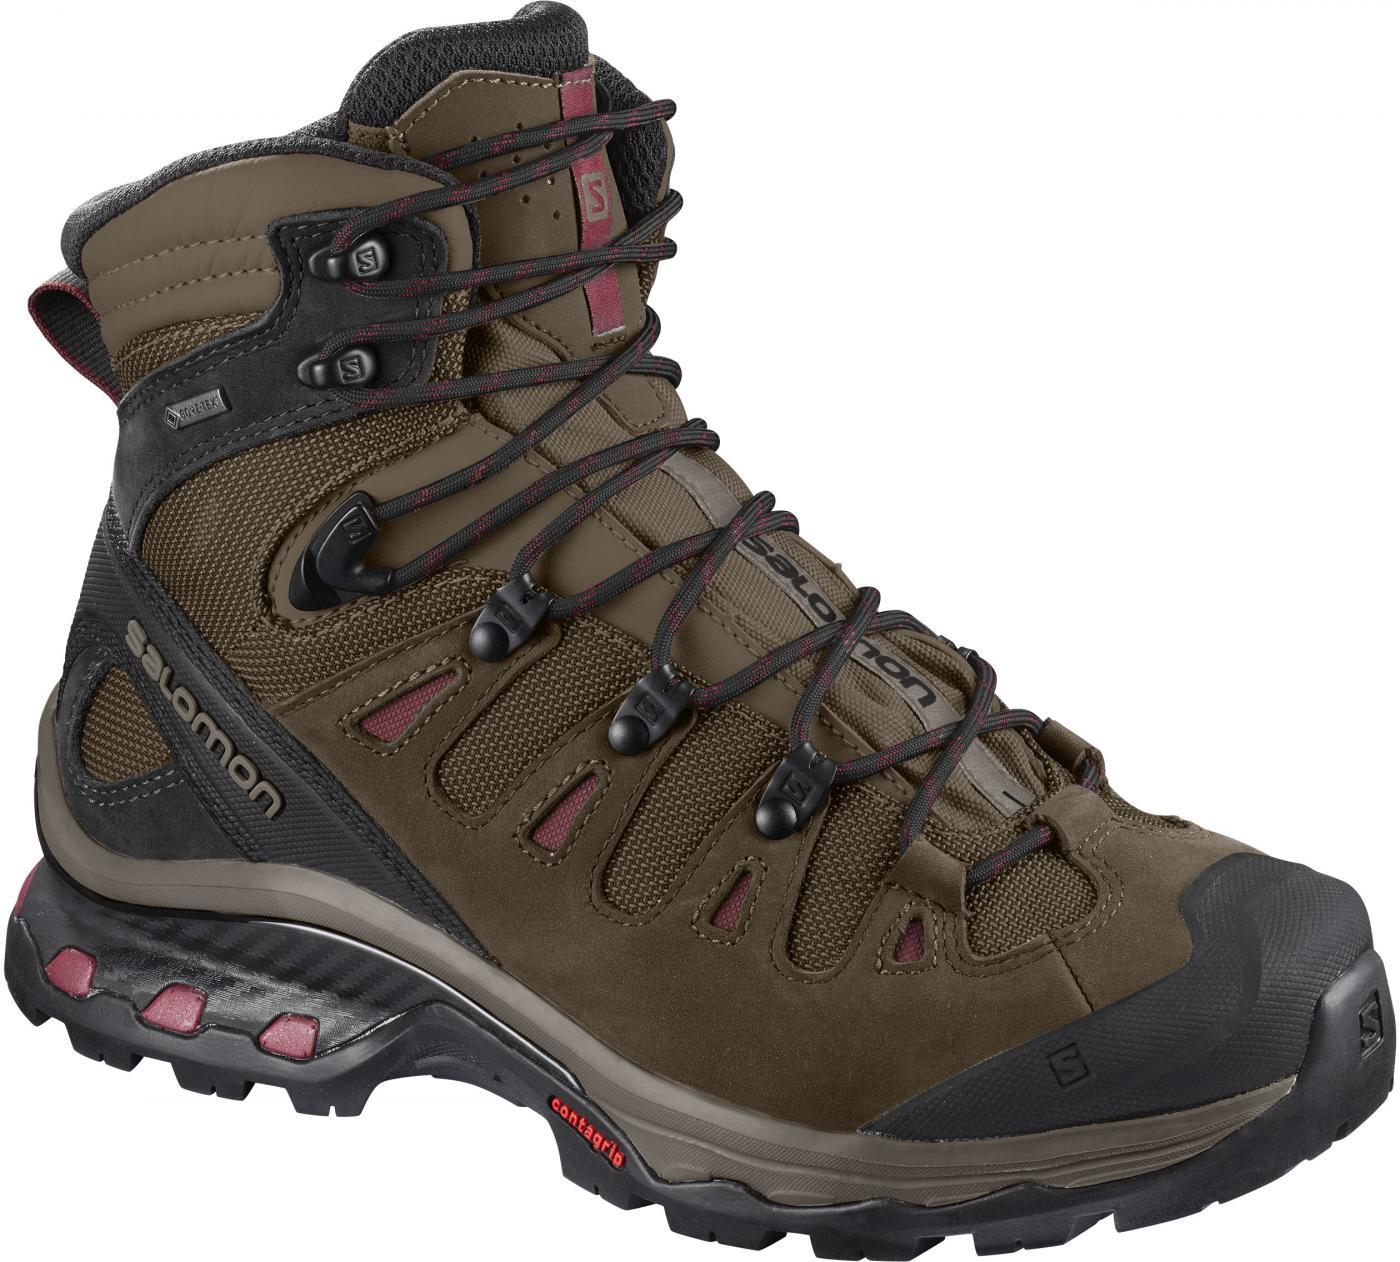 7e38142e9e7d Turistická obuv Salomon QUEST 4D 3 GTX W Teak Teak Tibe